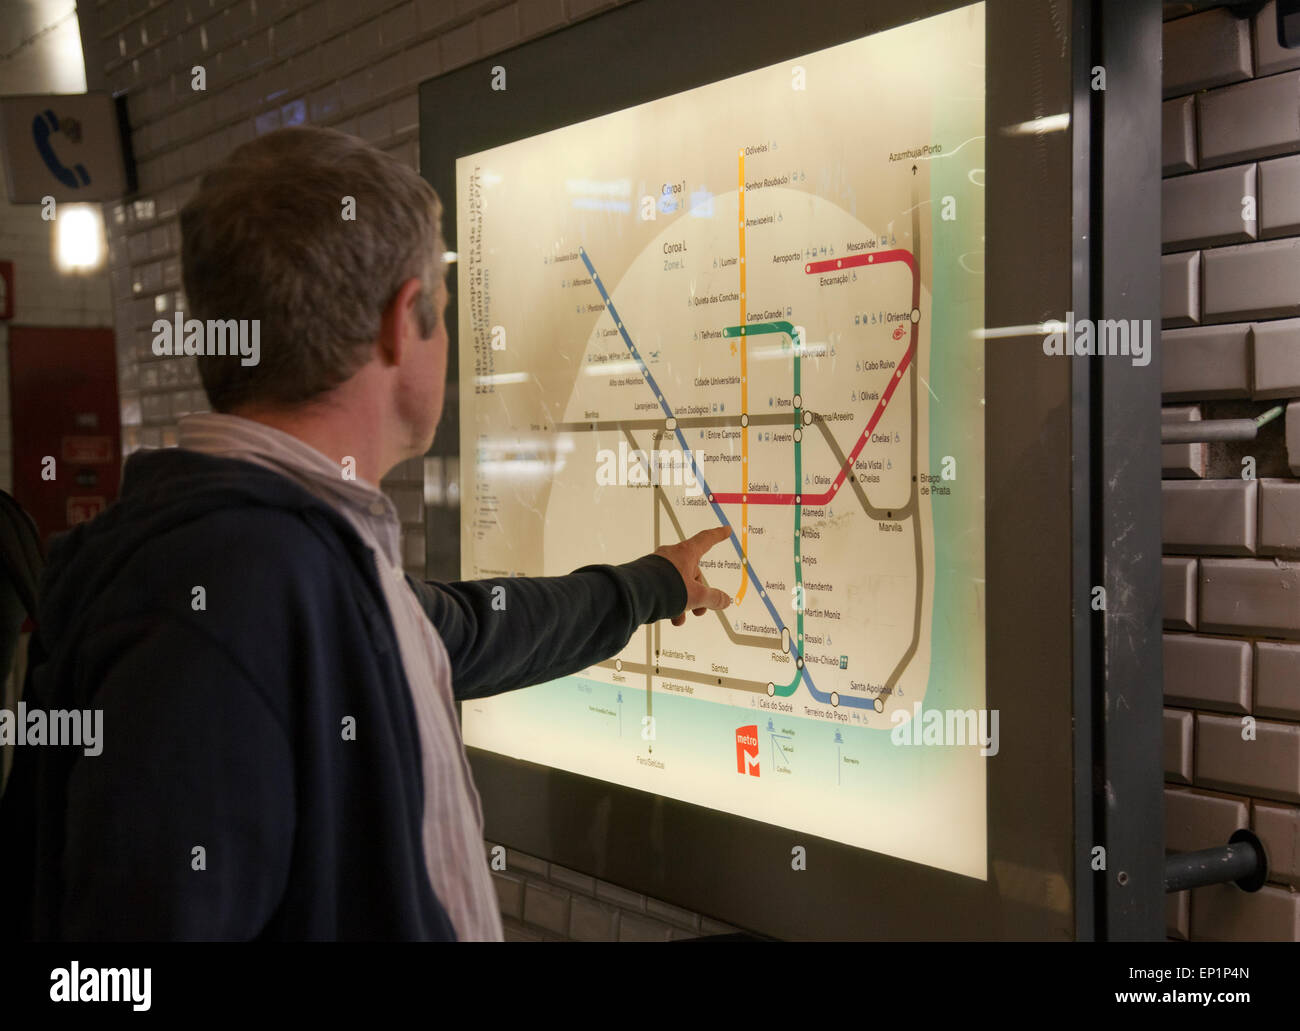 Metro Map Lisbon Portugal.Man Looking At Lisbon Metro Map On Platform In Lisbon Portugal